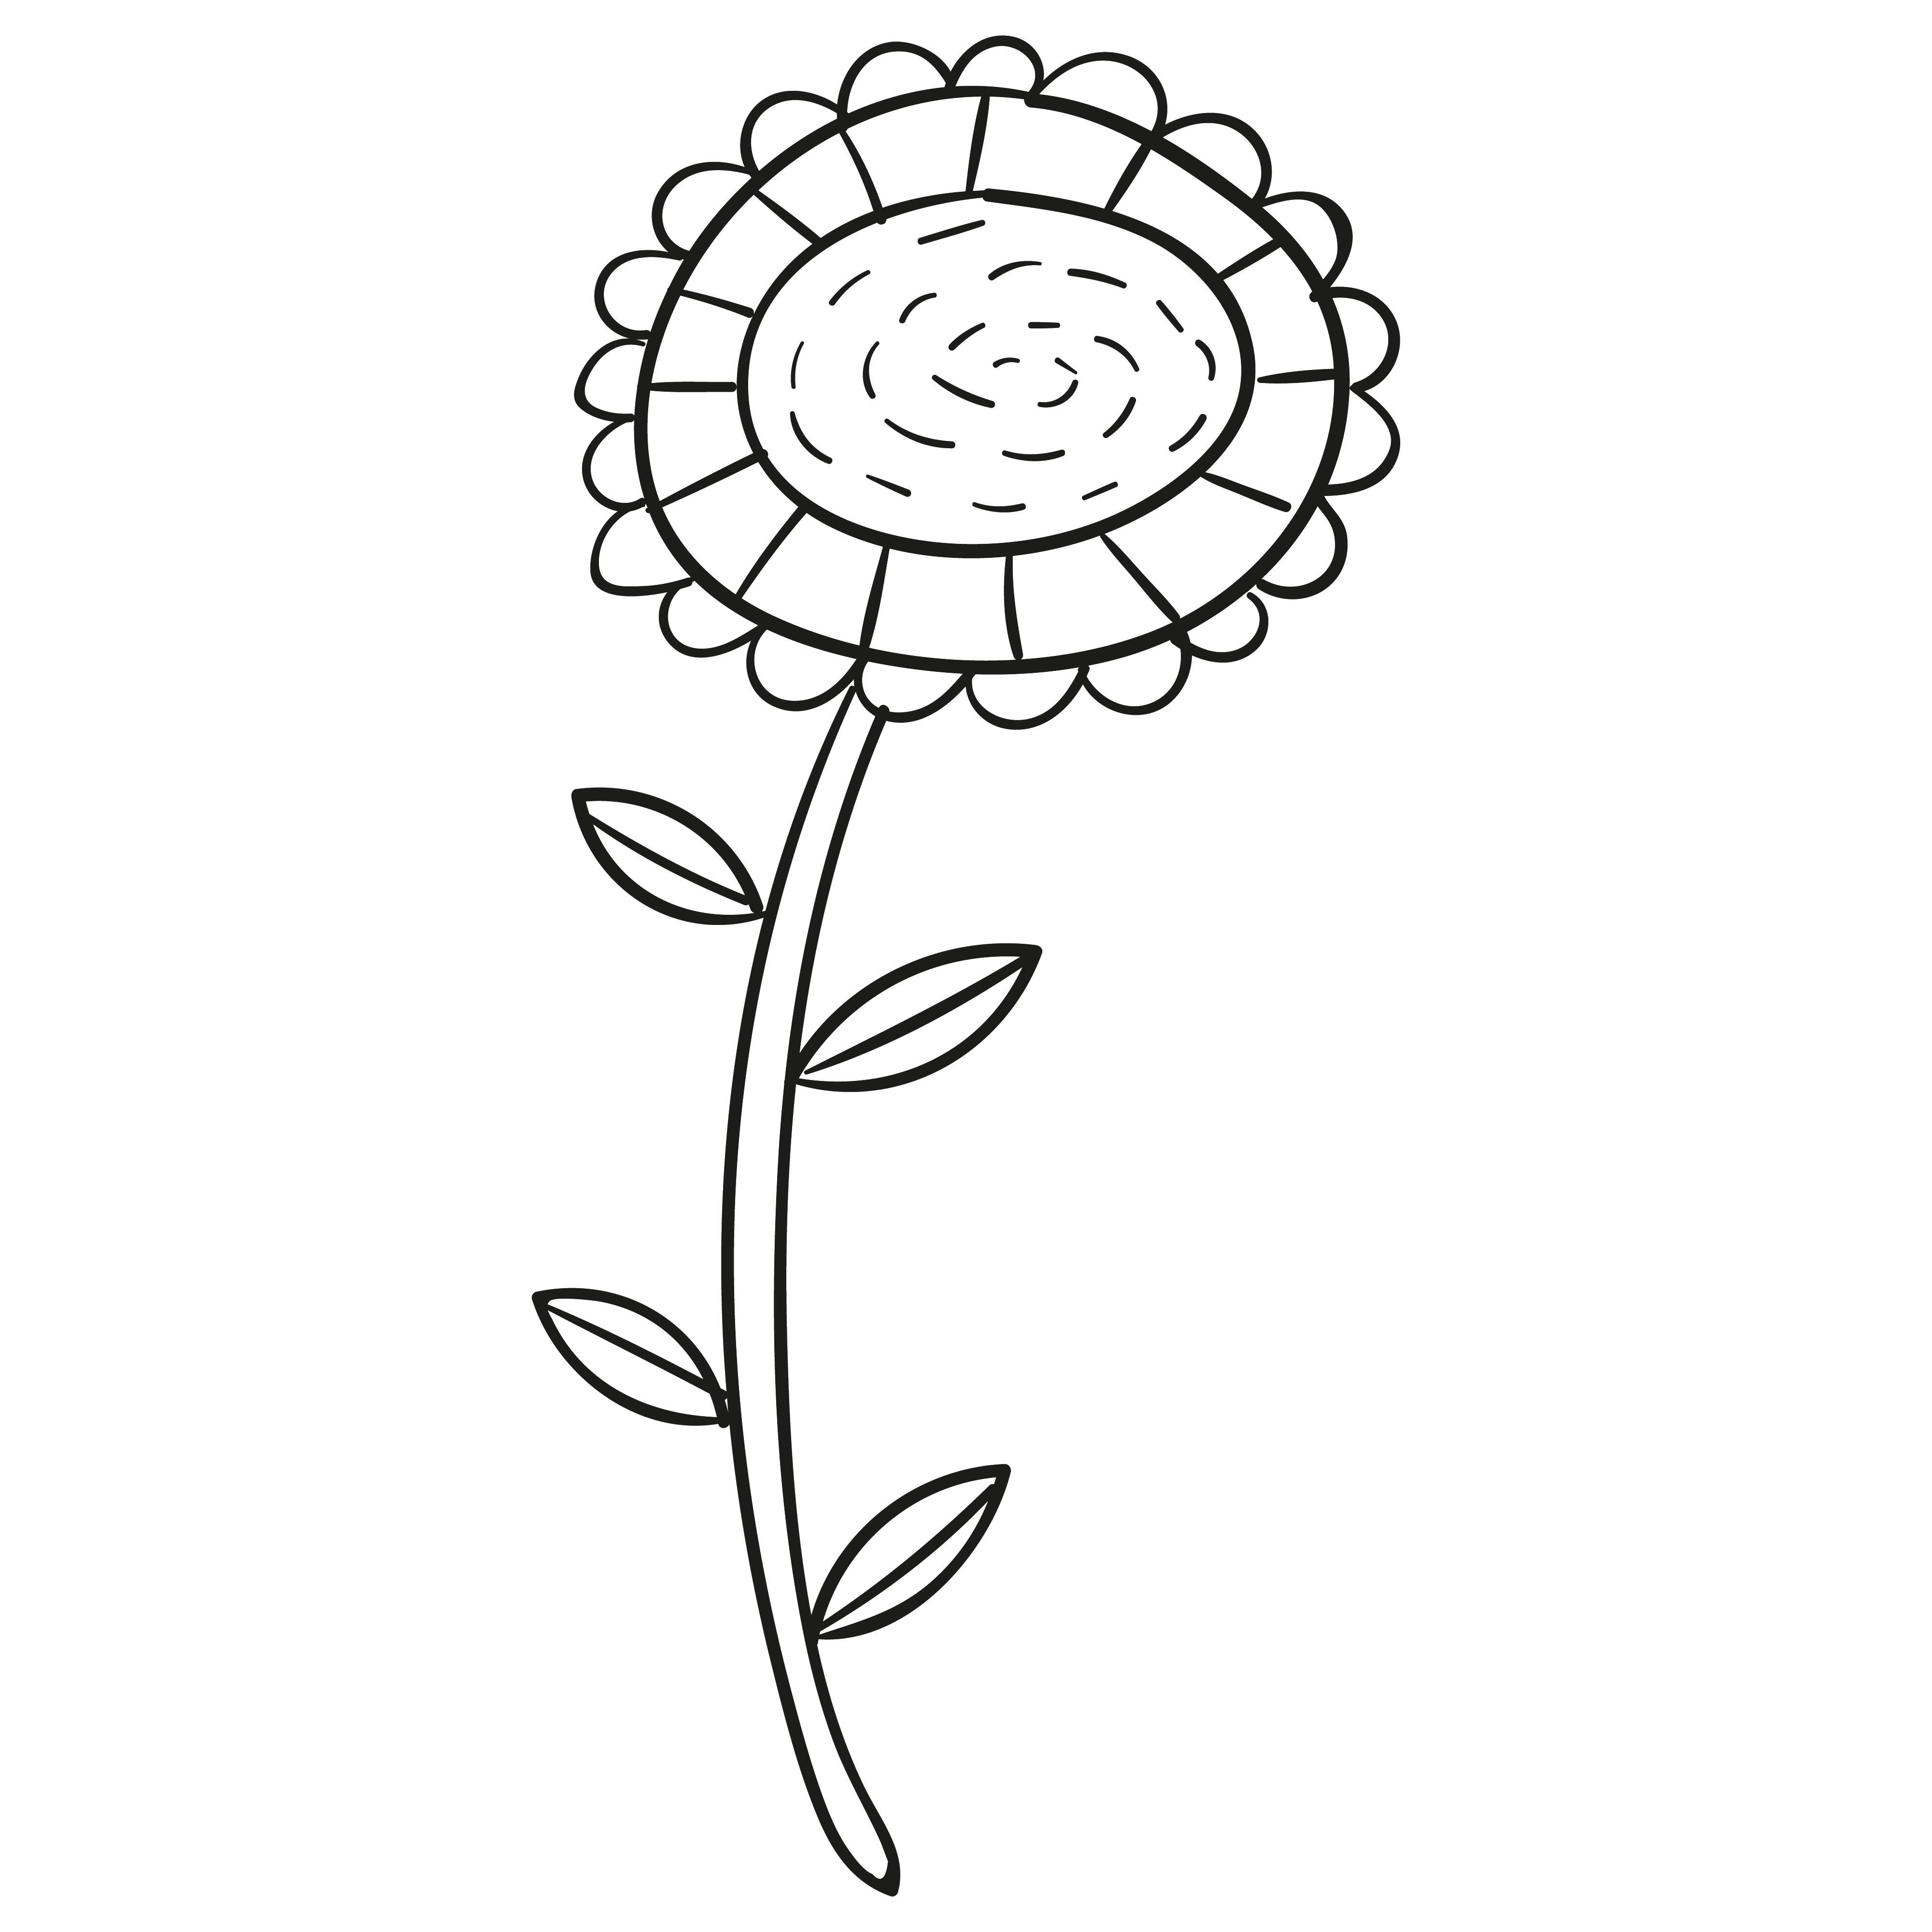 Printable Sunflower Template